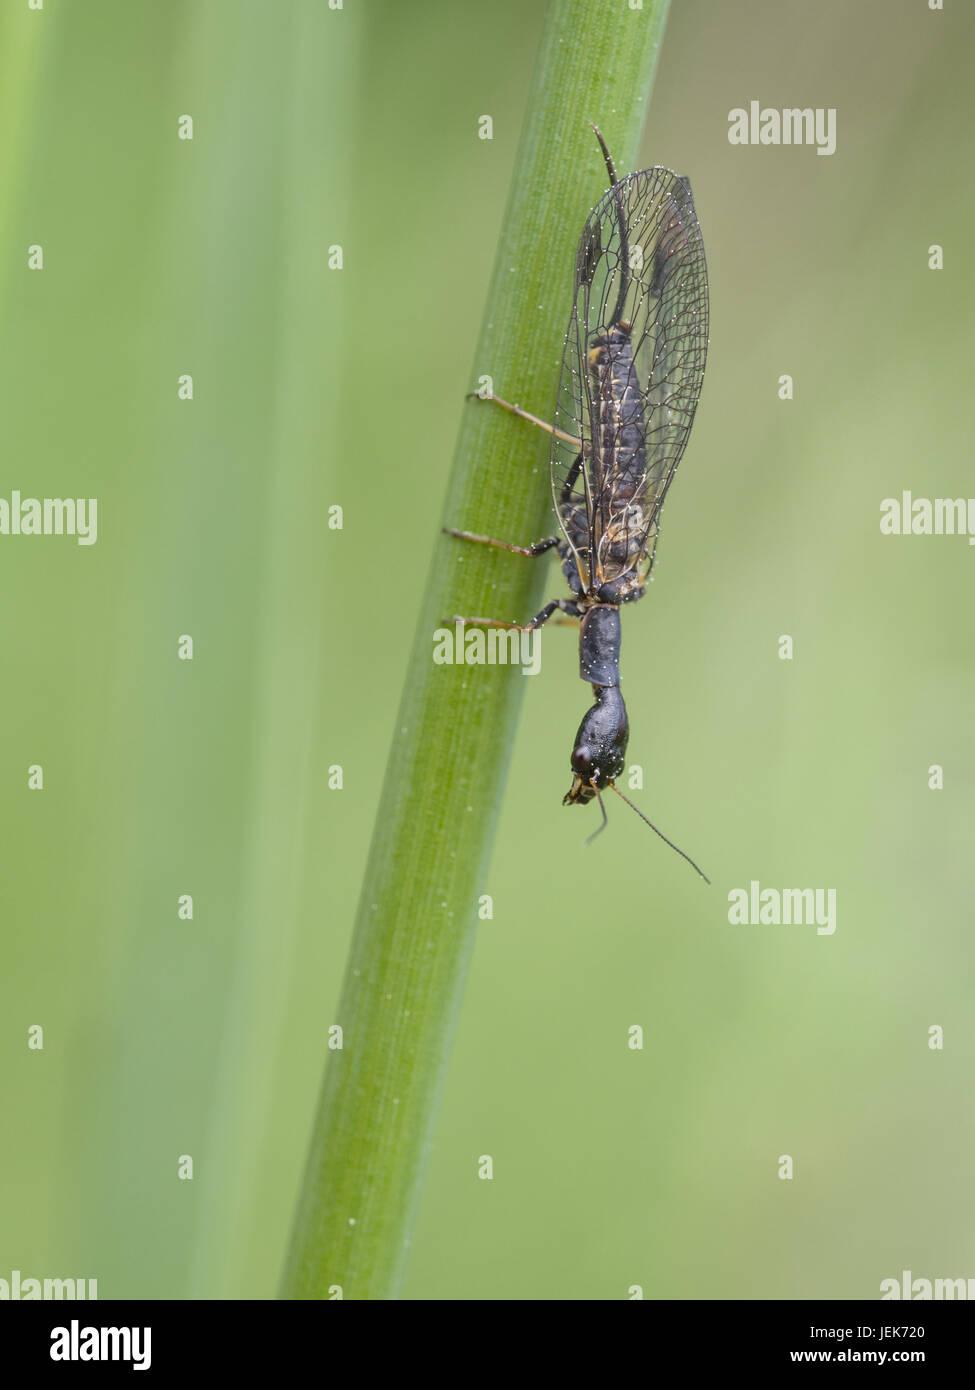 Snakefly  (Phaeostigma notata) - Stock Image